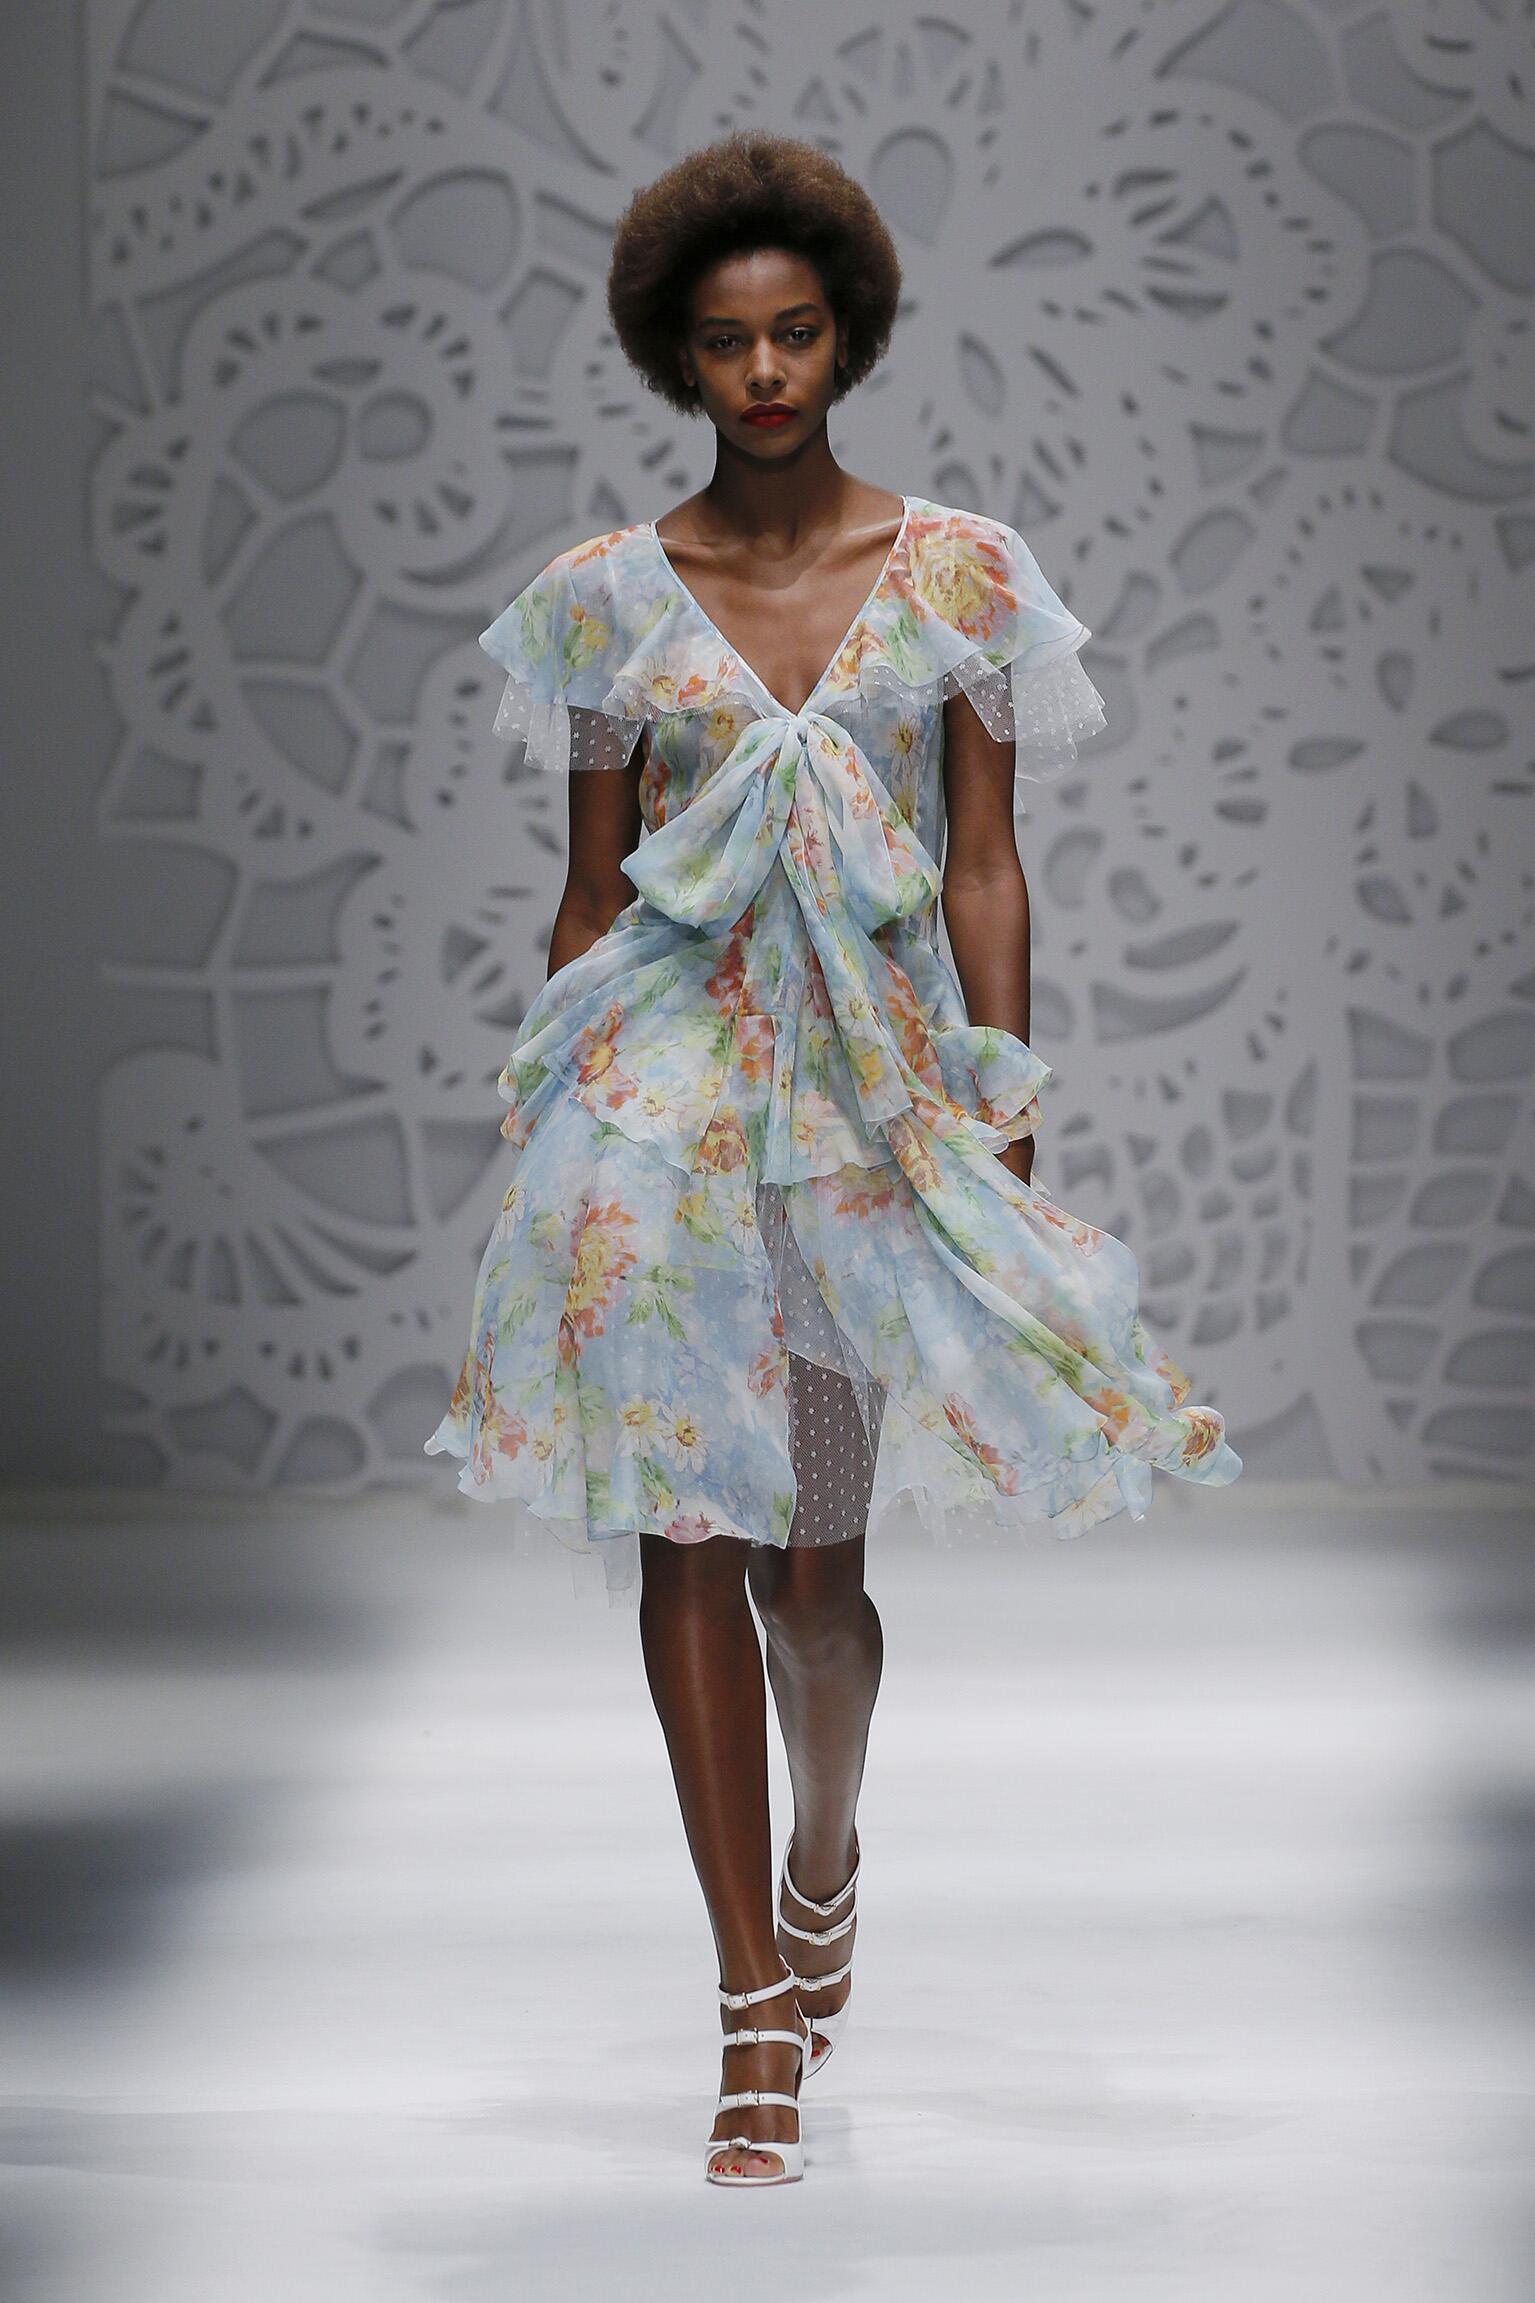 Catwalk Blumarine Woman Fashion Show Summer 2018